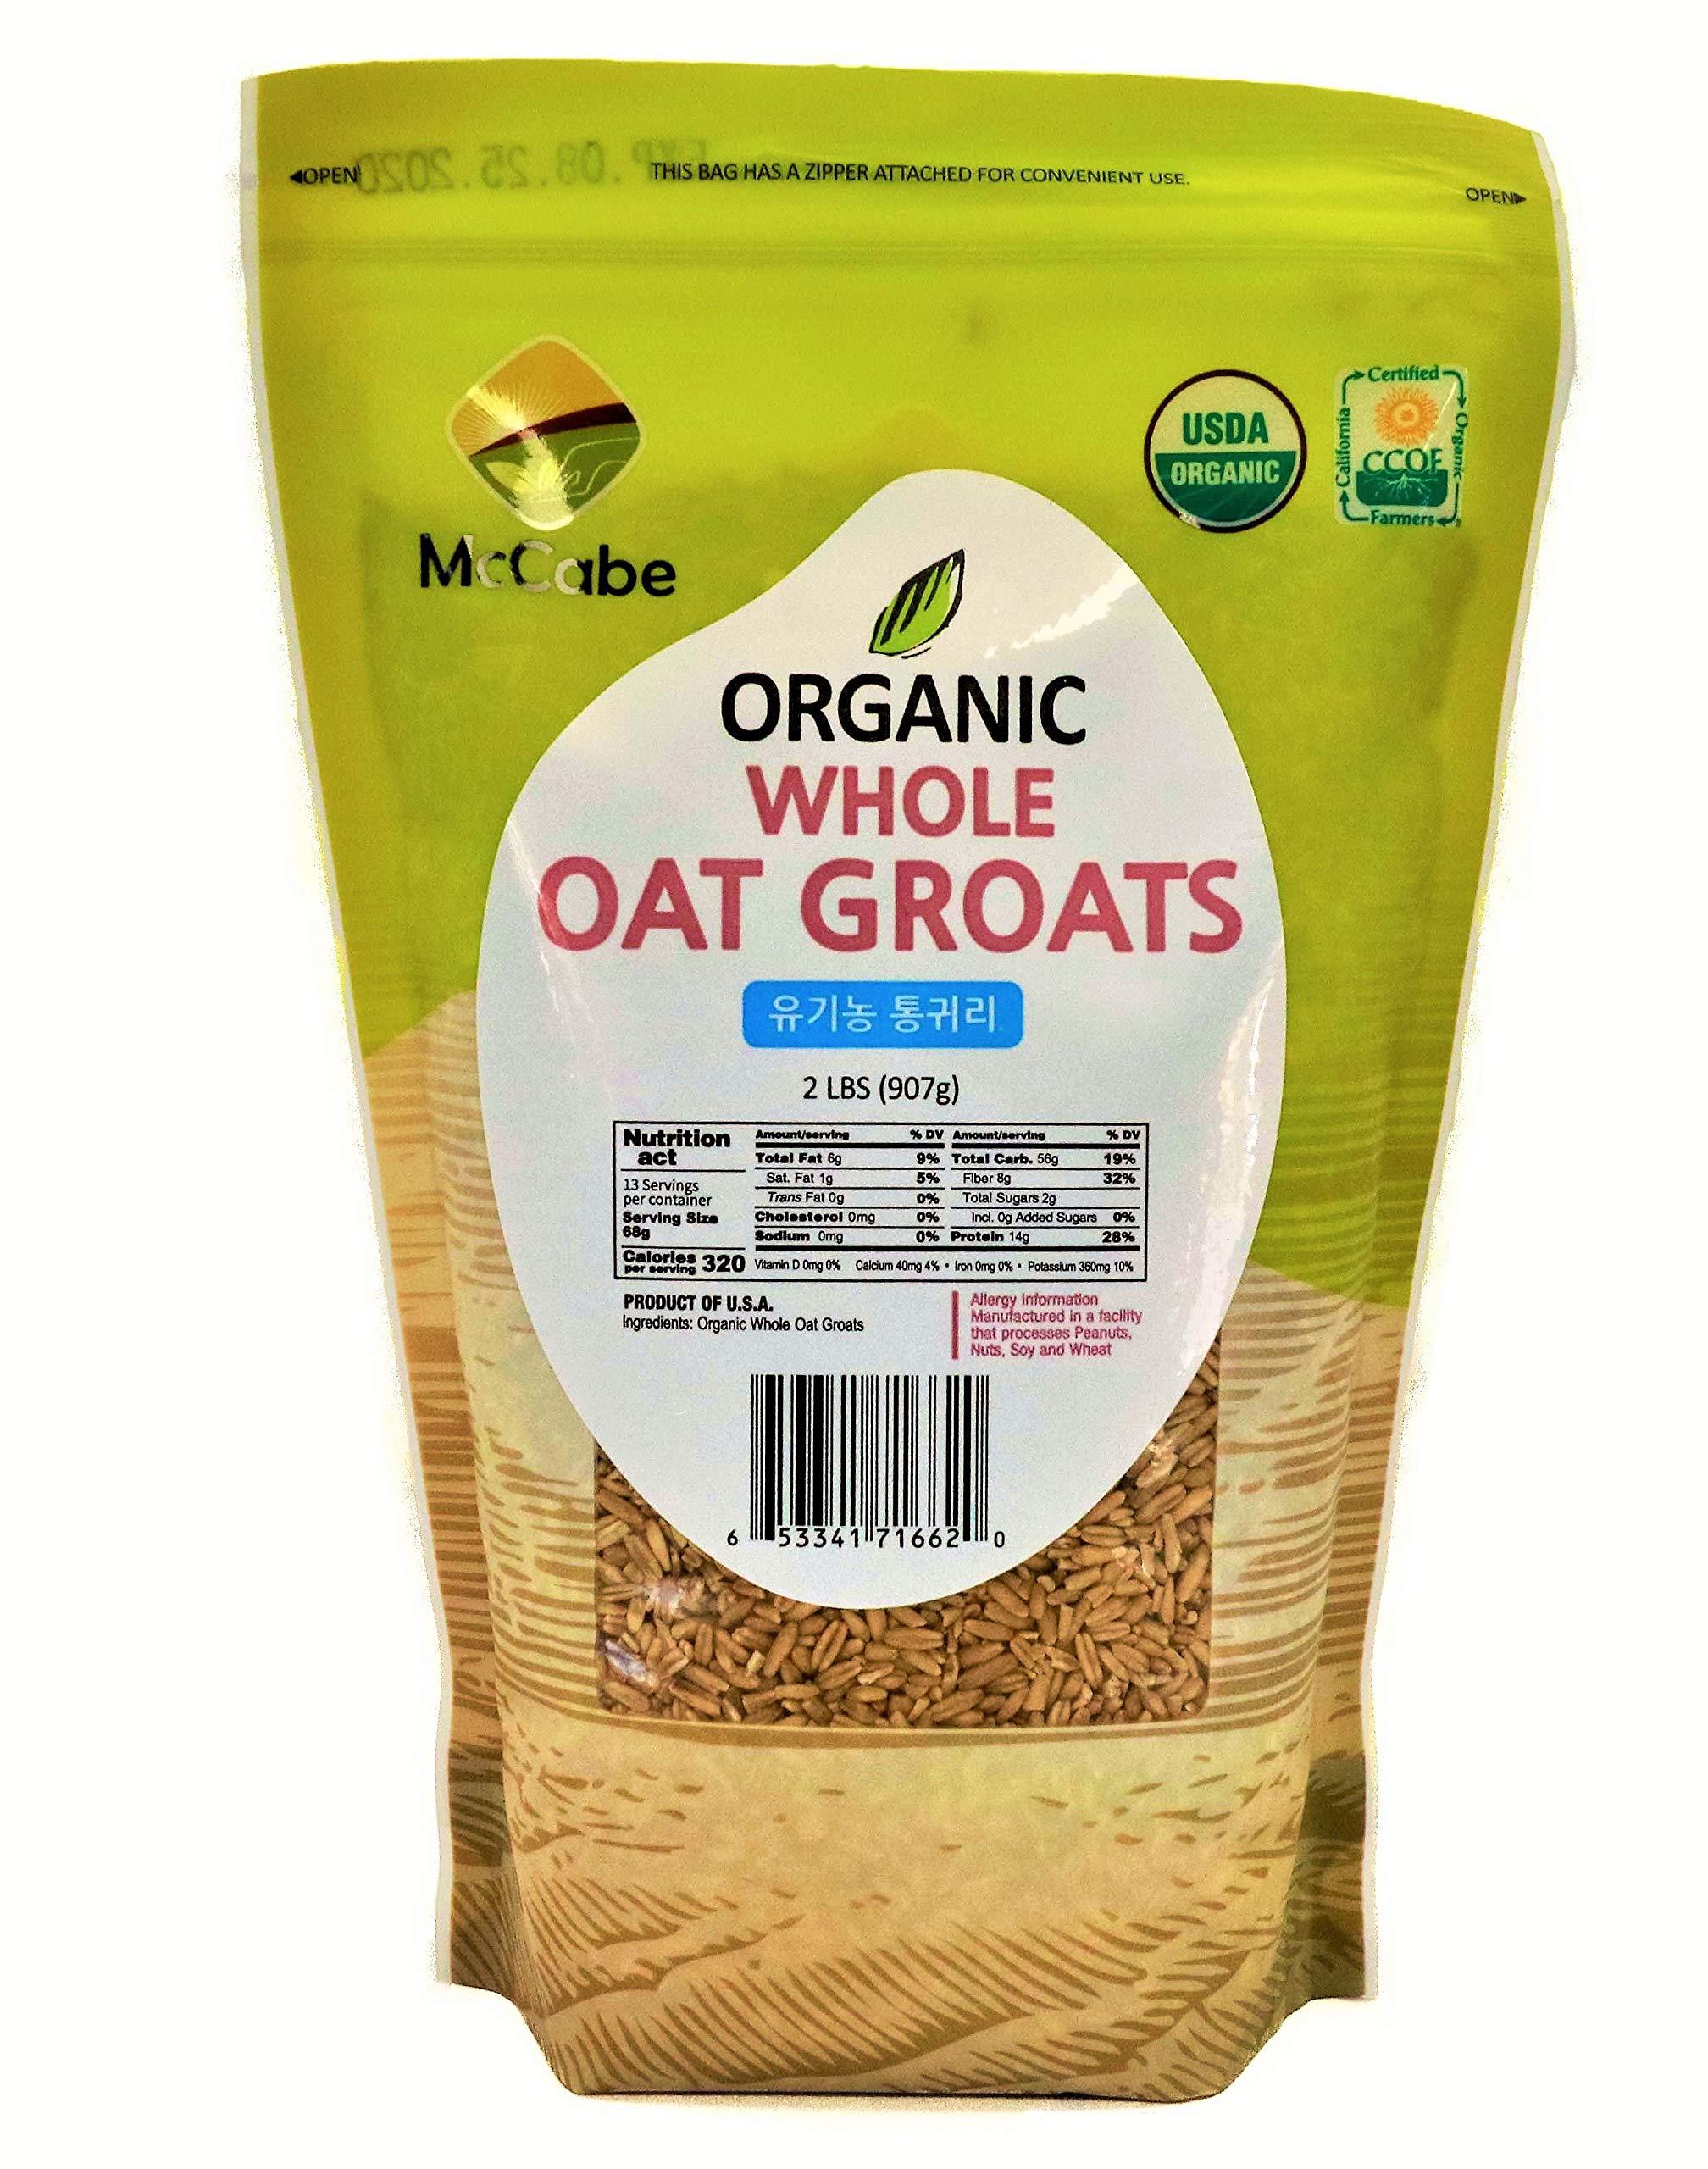 McCabe Organic Whole Oat Groats, 2lbs